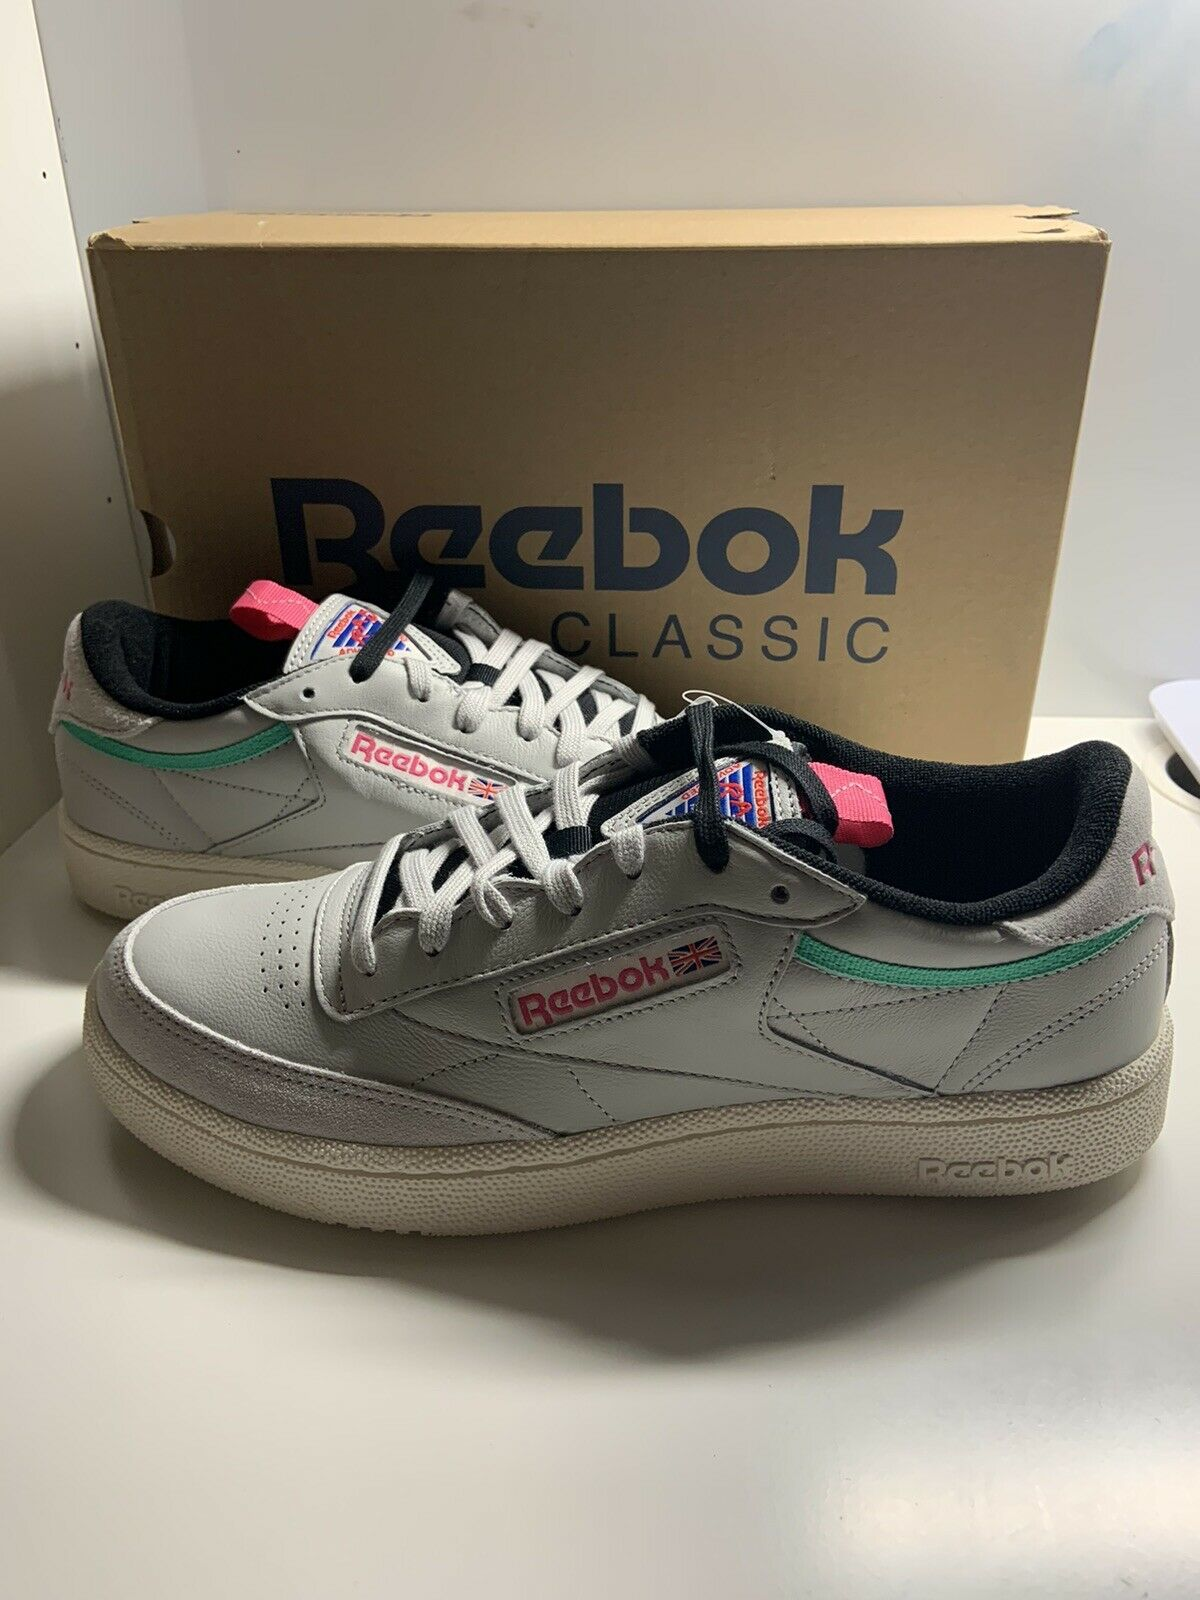 reebok club c men's athletic shoes